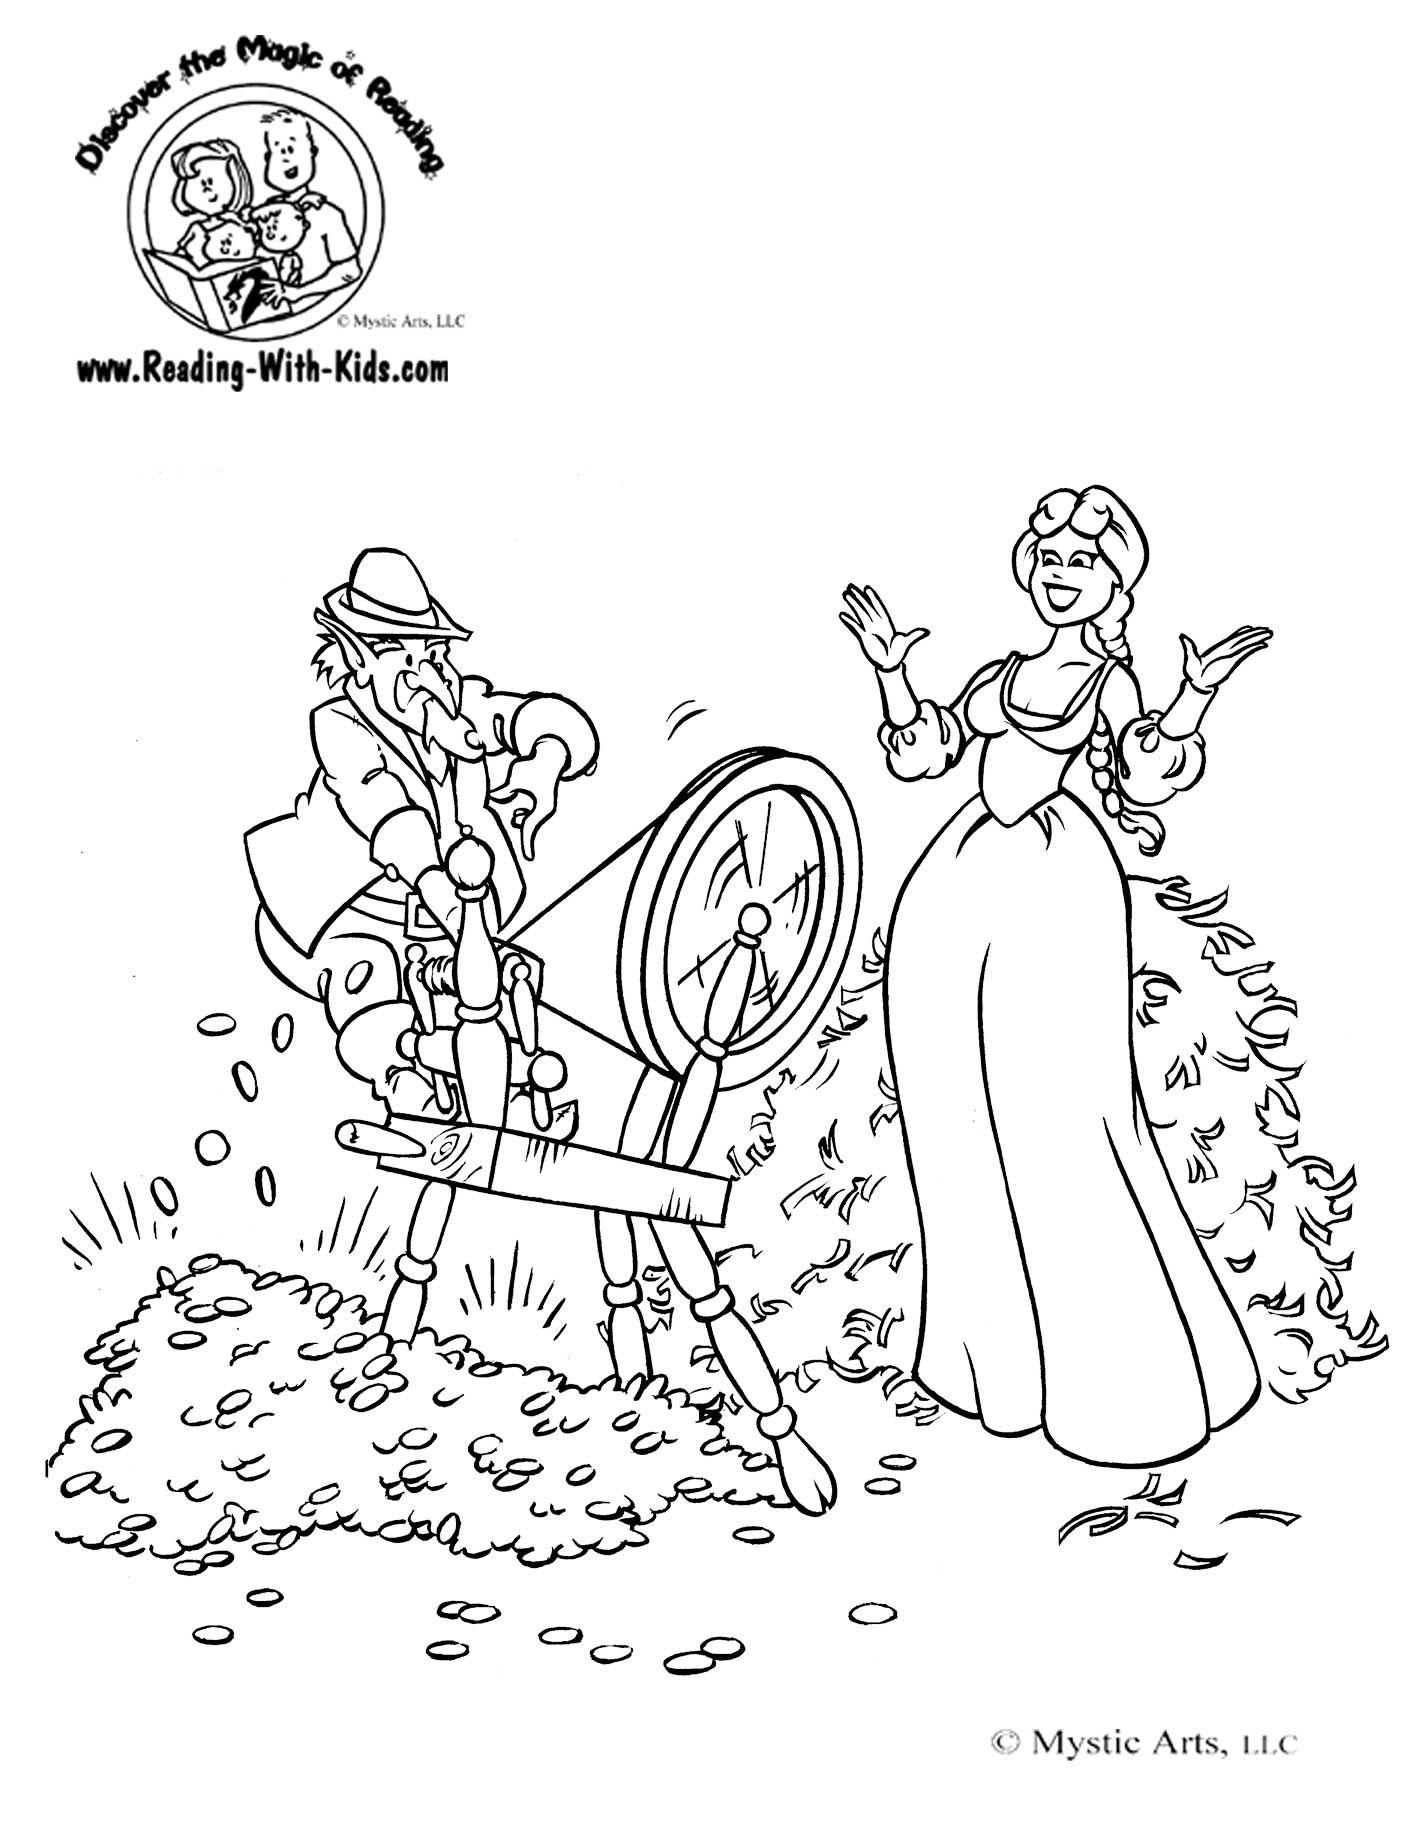 Rumplestilskin Coloring Sheet FairyTale FairyTales